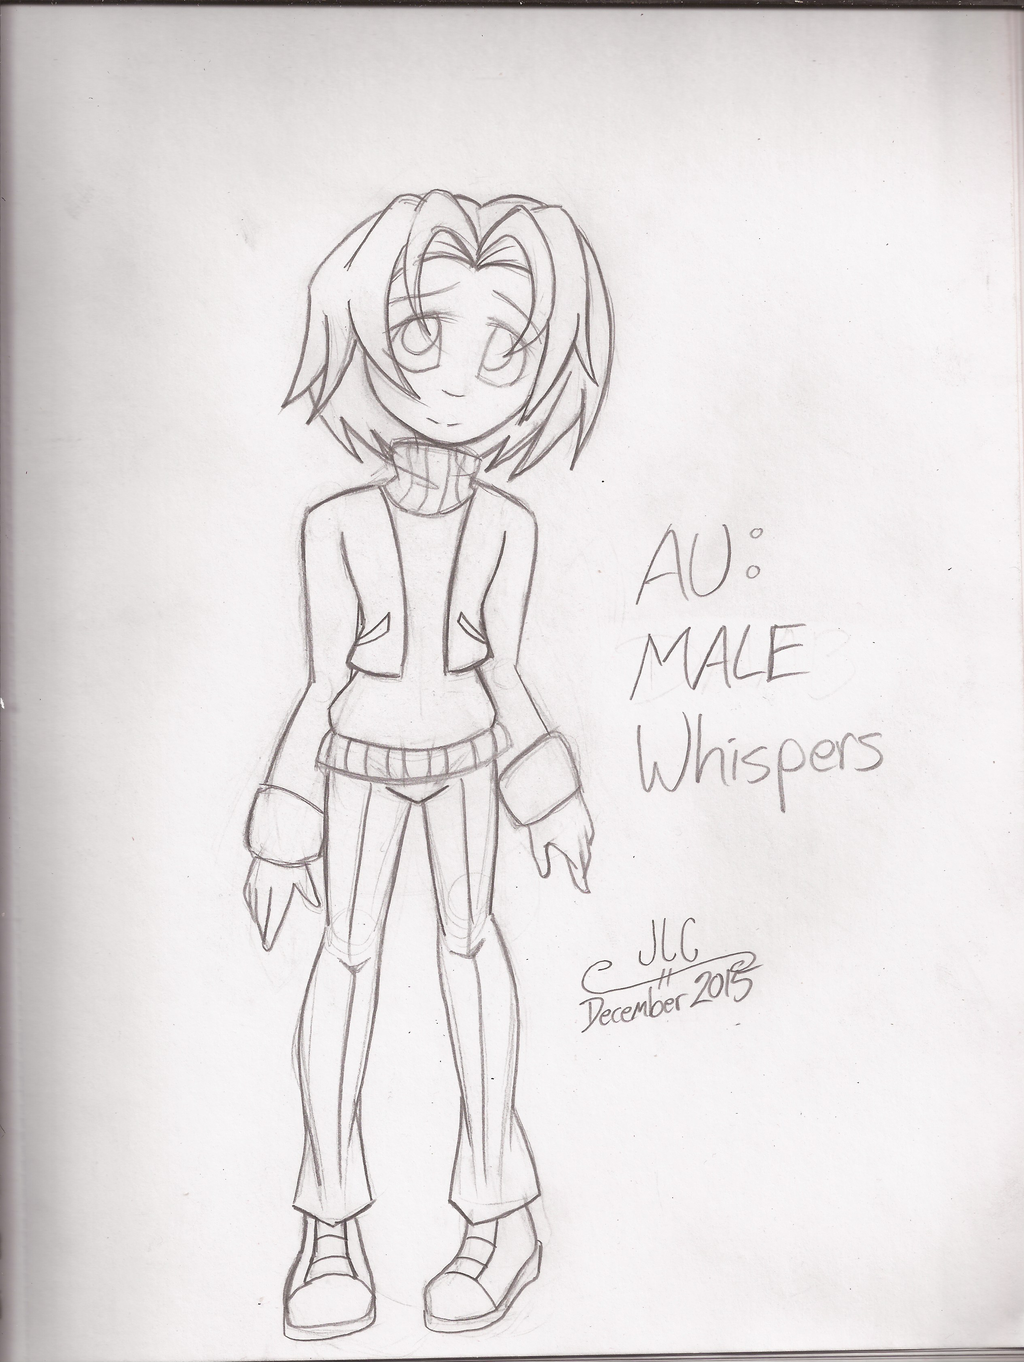 Character Drawcember Week 2 - AU Whispers